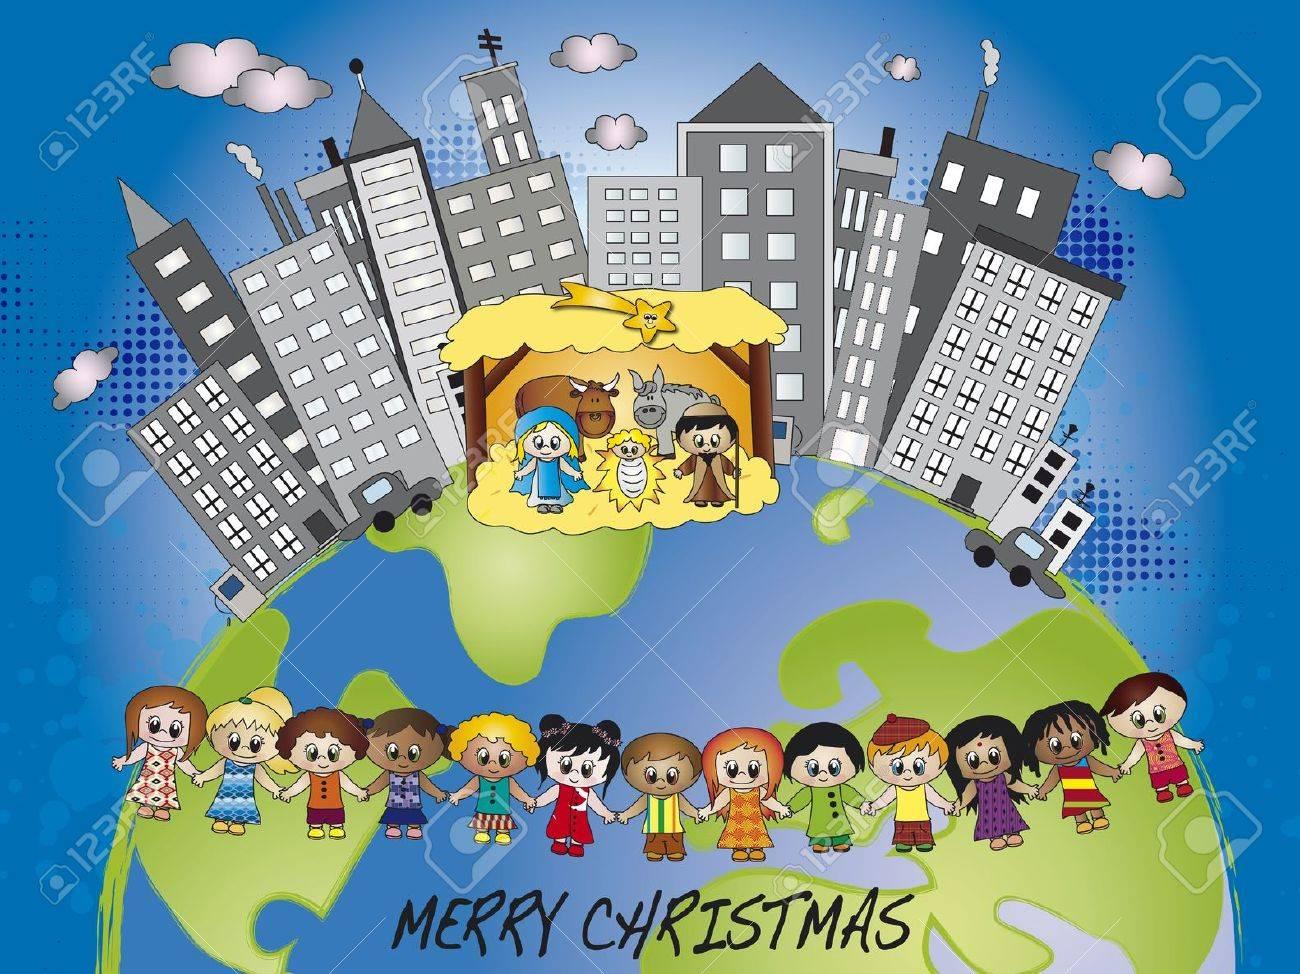 nativity in the world Stock Photo - 16471281